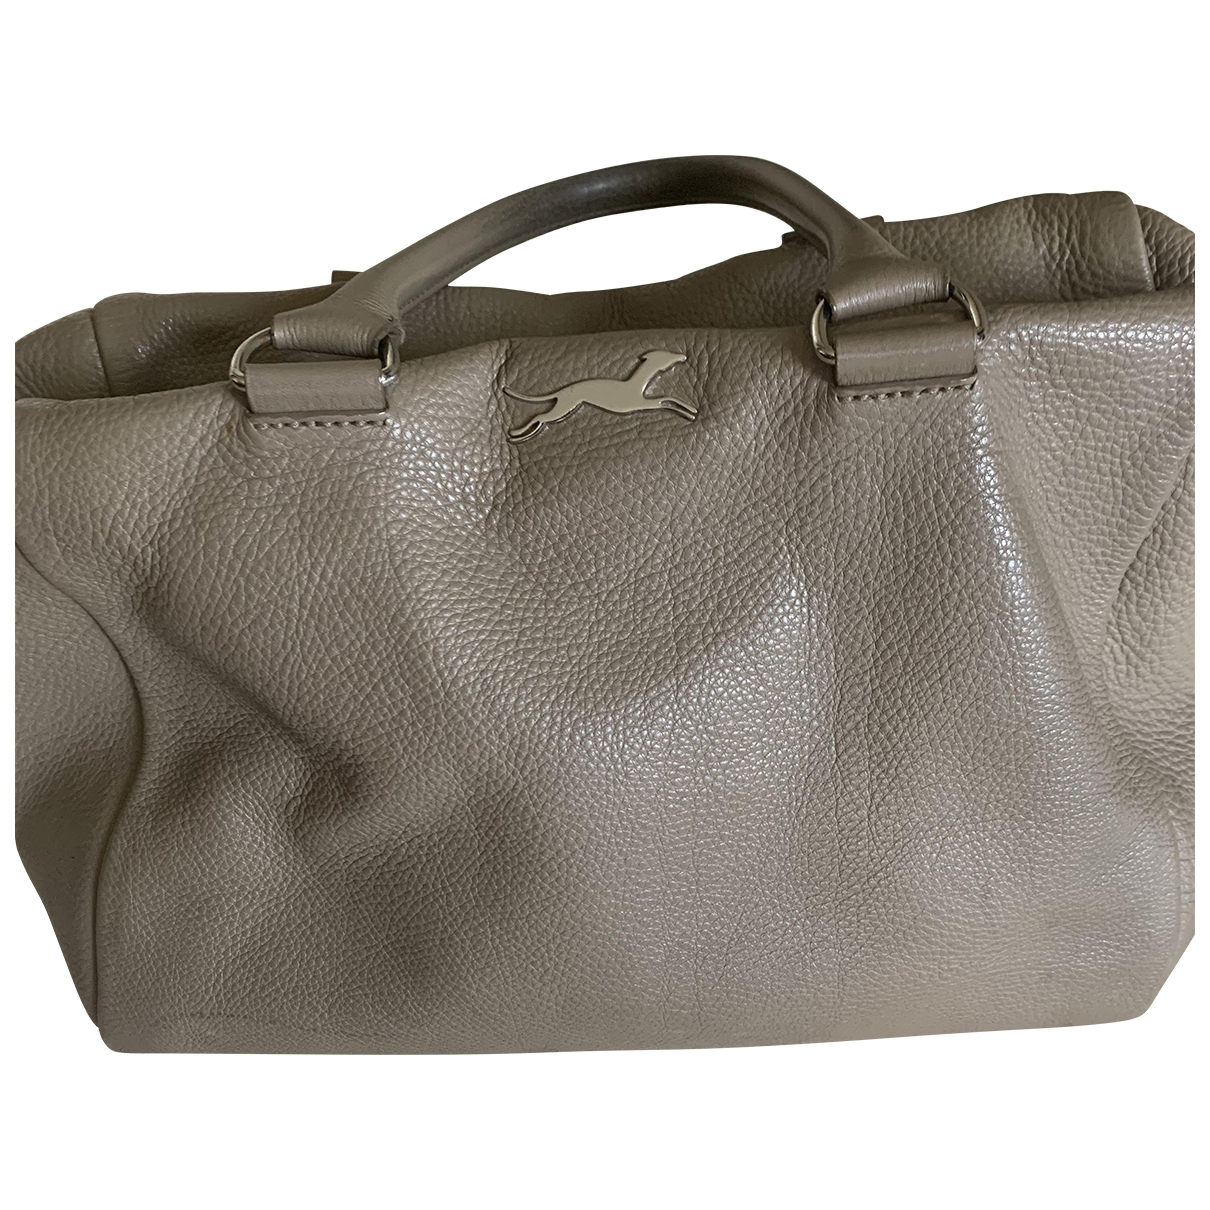 Bimba Y Lola \N Grey Leather handbag for Women \N